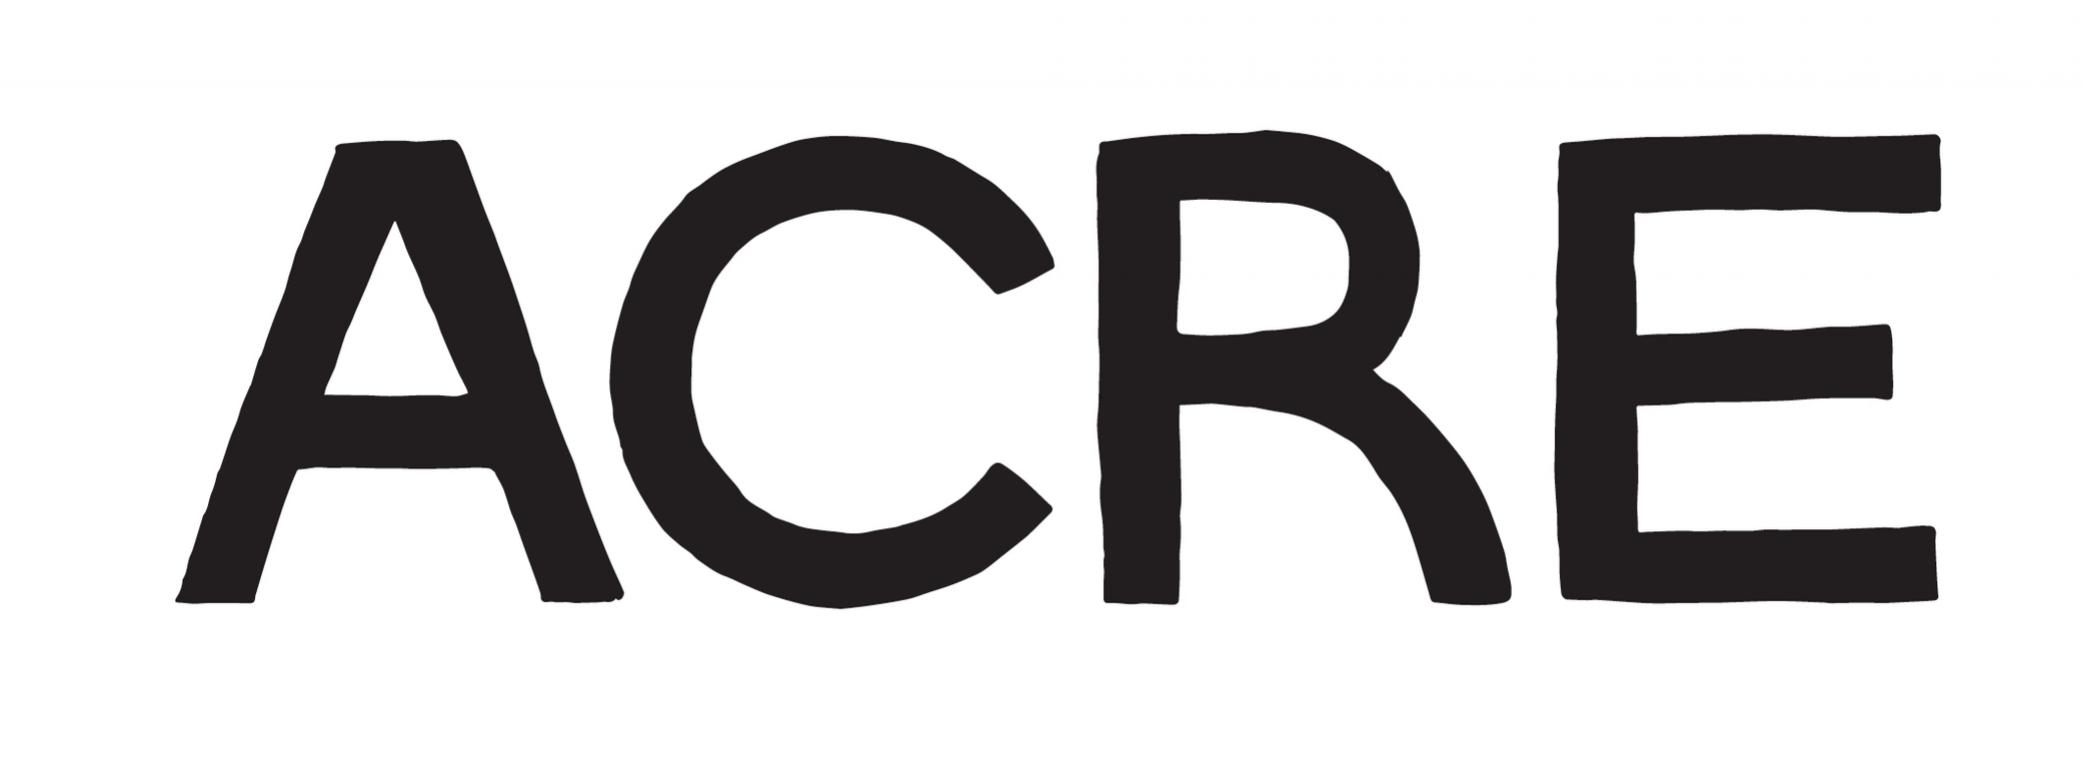 ACRE_logo.jpg.png